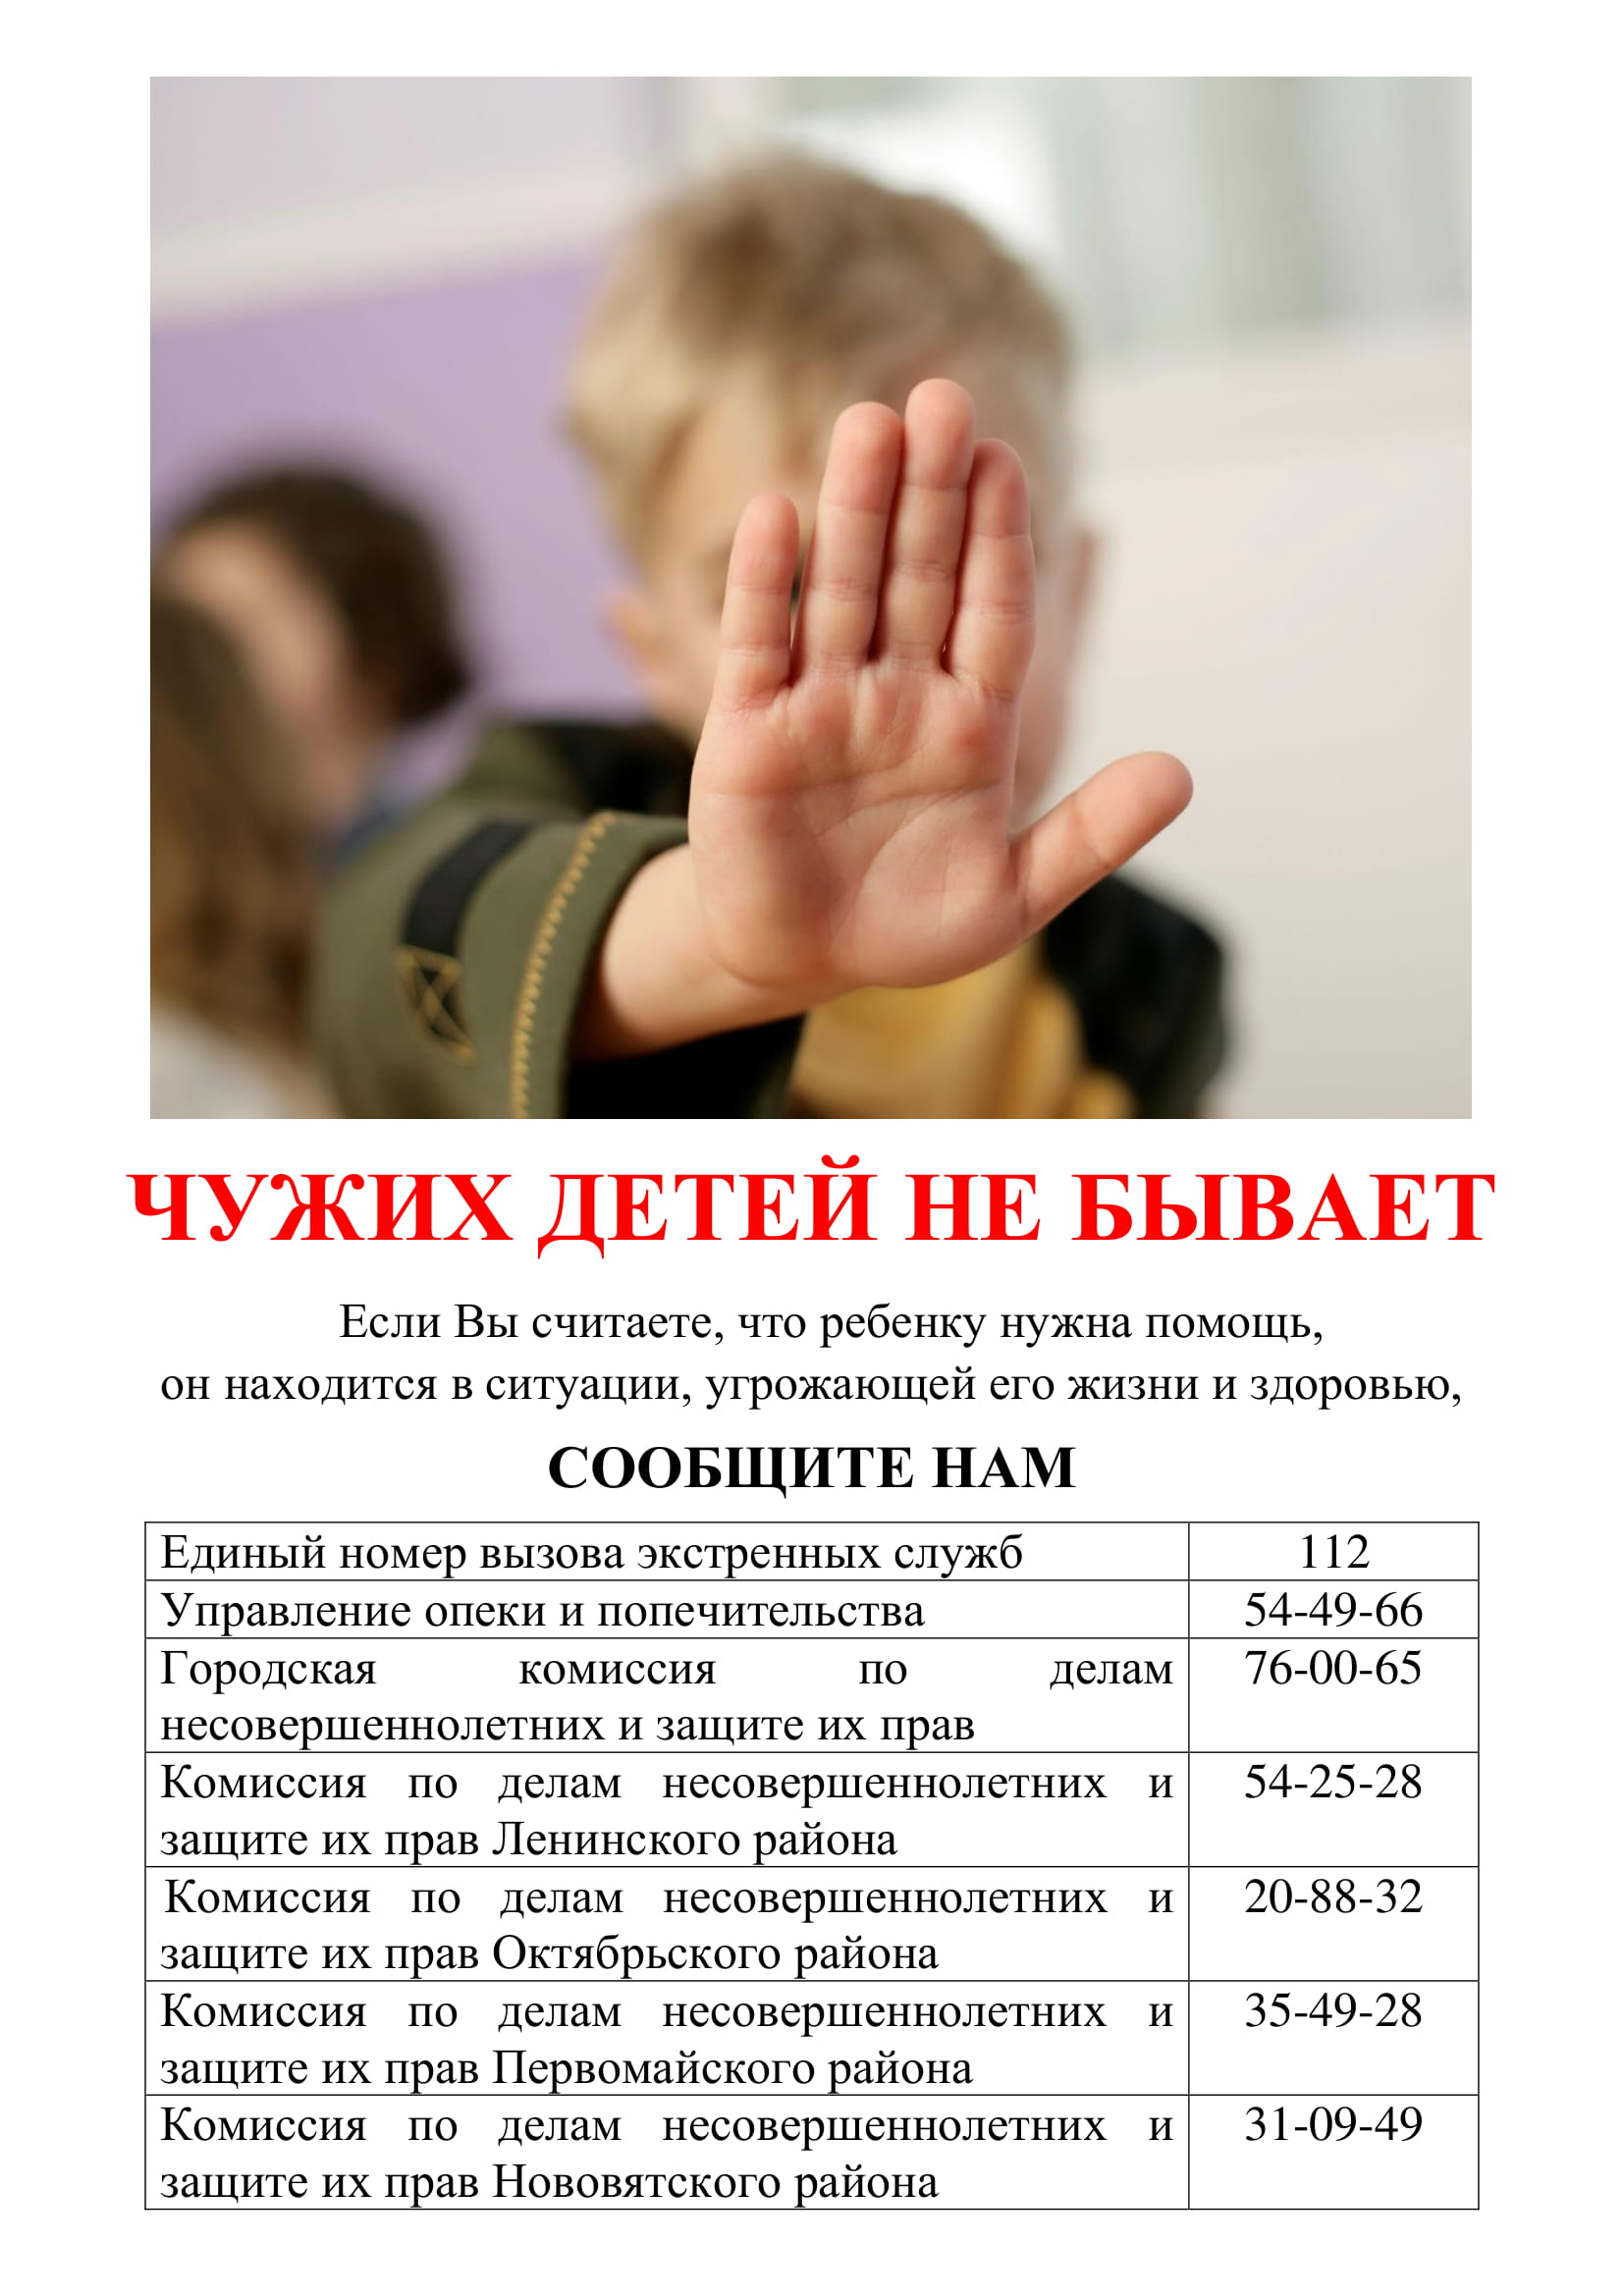 http://www.14school.ru/sites/default/files/files/chuzhih-detey-ne-byvaet-1.jpg